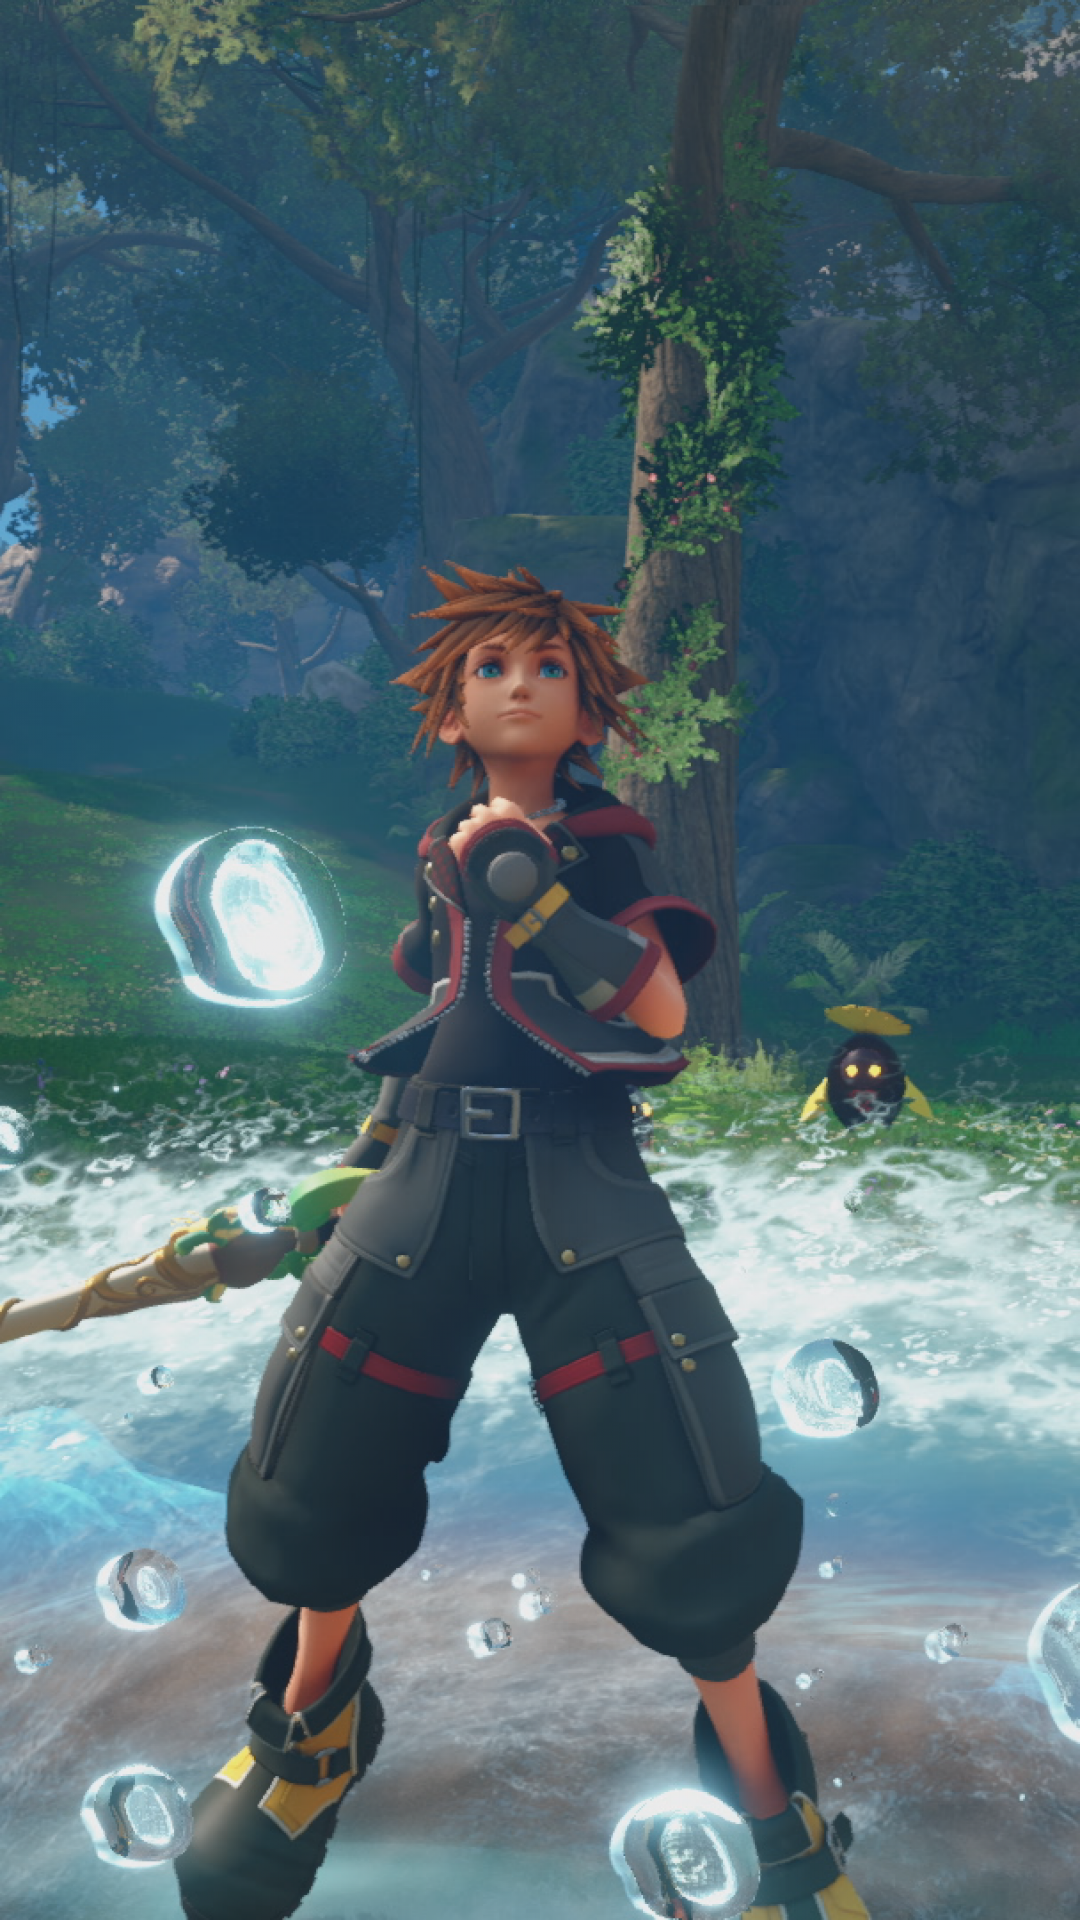 Kingdom Hearts Iii, Anime Games, Sora - Kingdom Hearts Iii , HD Wallpaper & Backgrounds